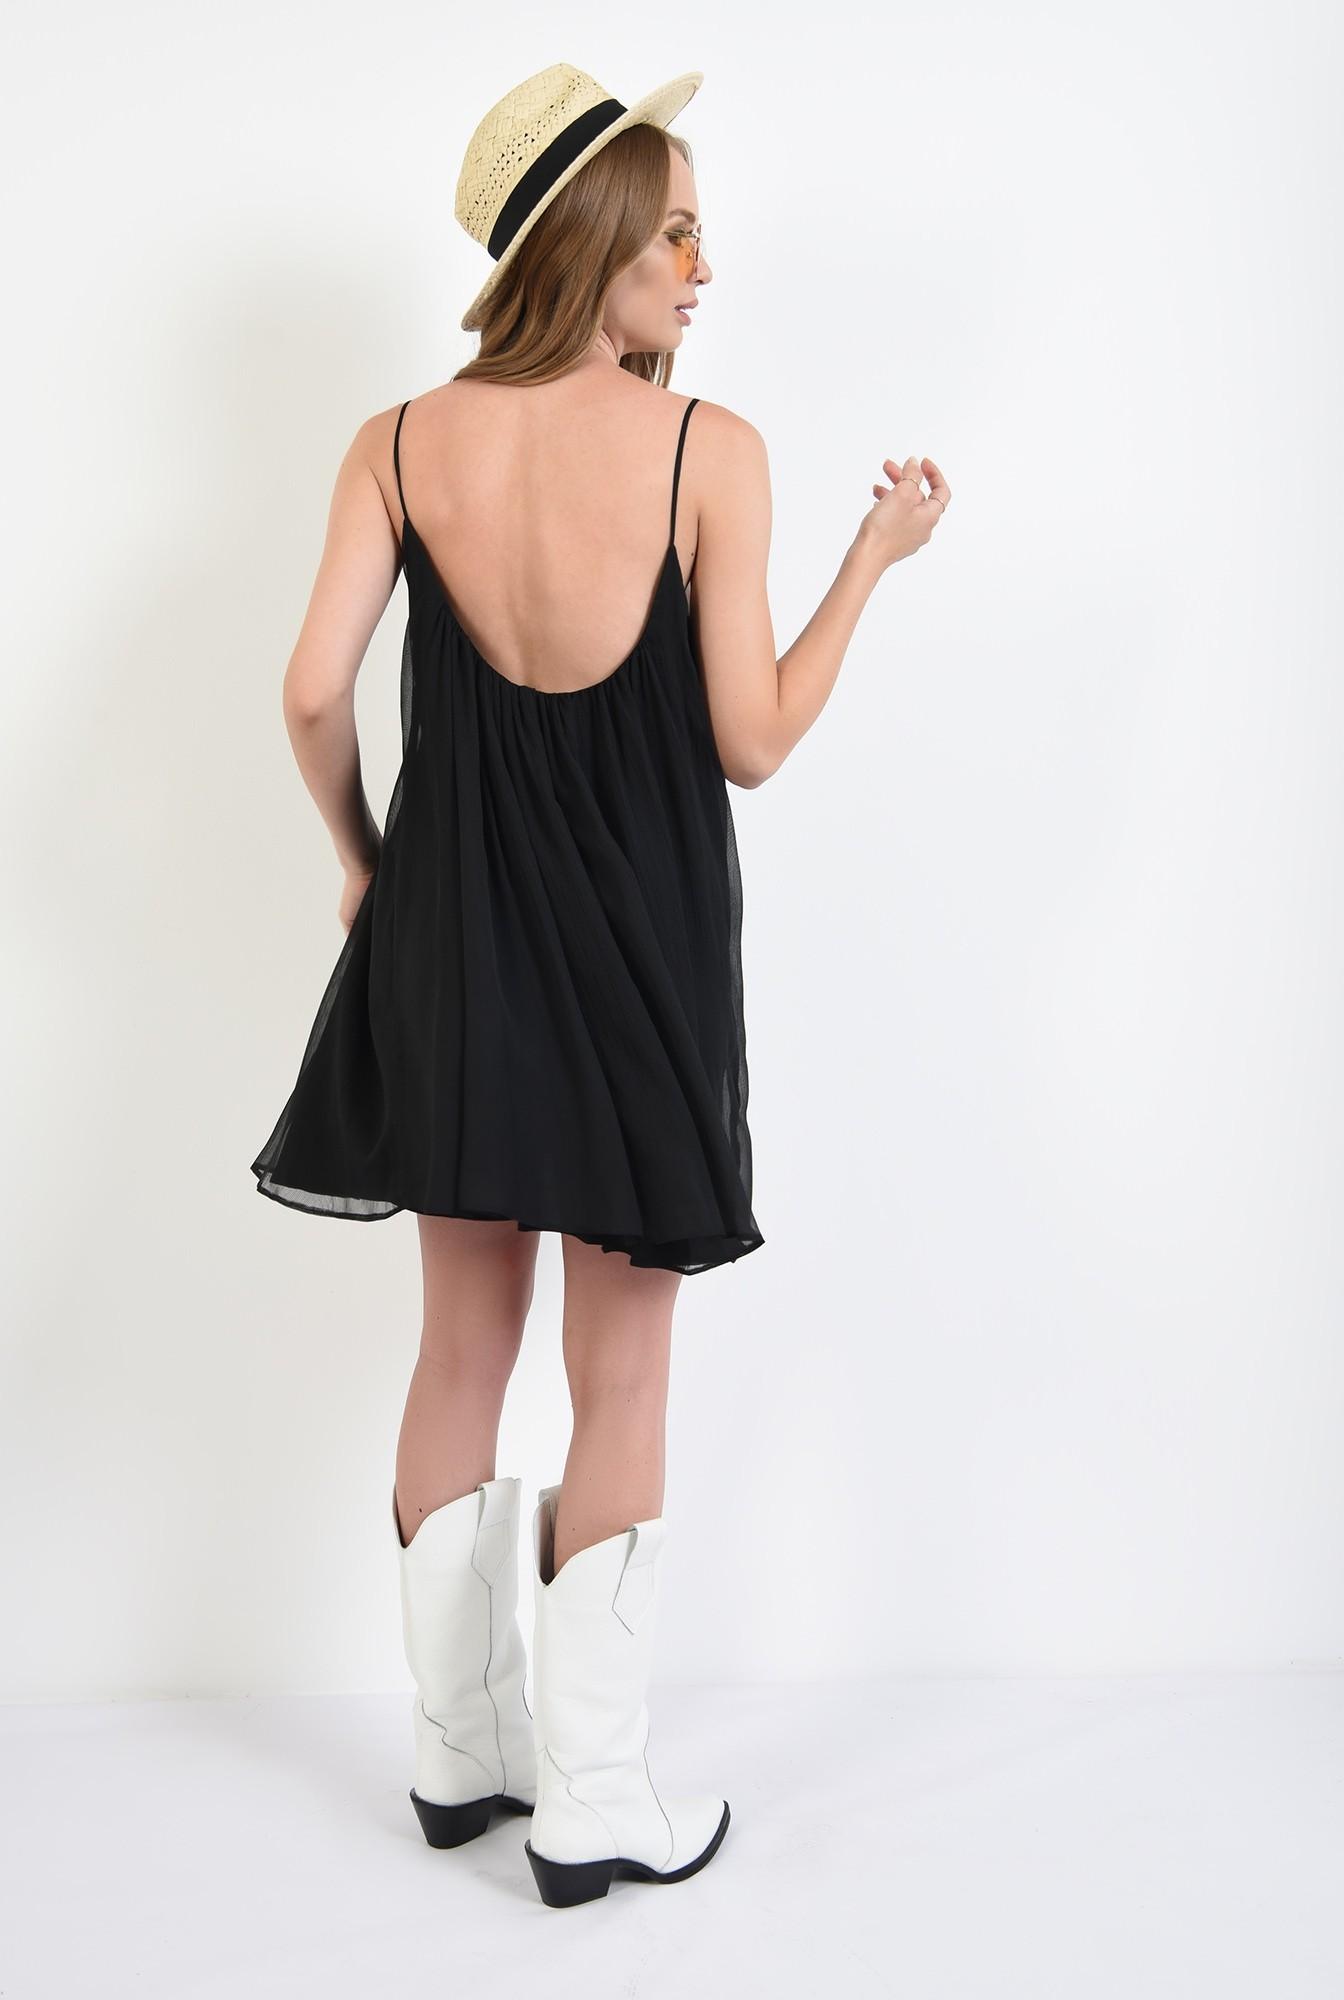 1 - rochie larga, tip furou, neagra, Poema